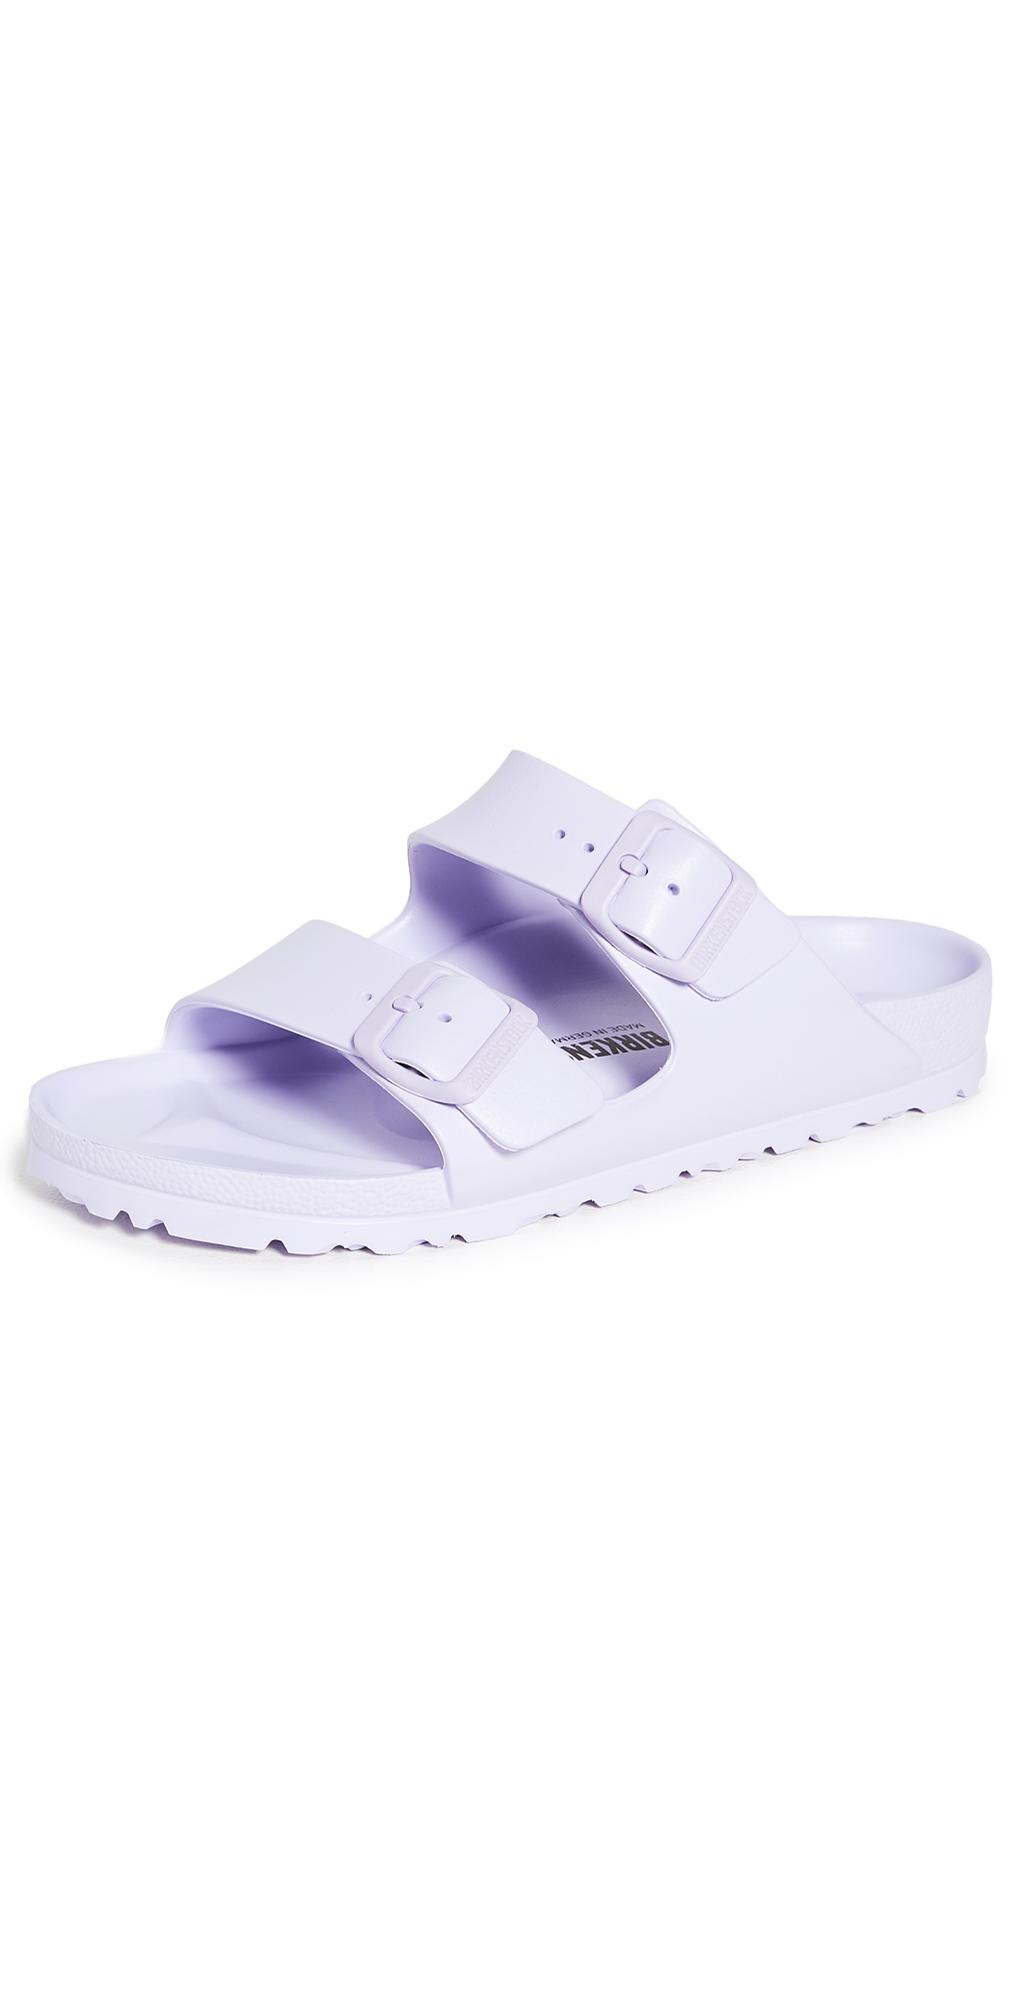 Birkenstock Women's Arizona Essentials Eva Two-strap Sandals From Finish Line In Purple Fog